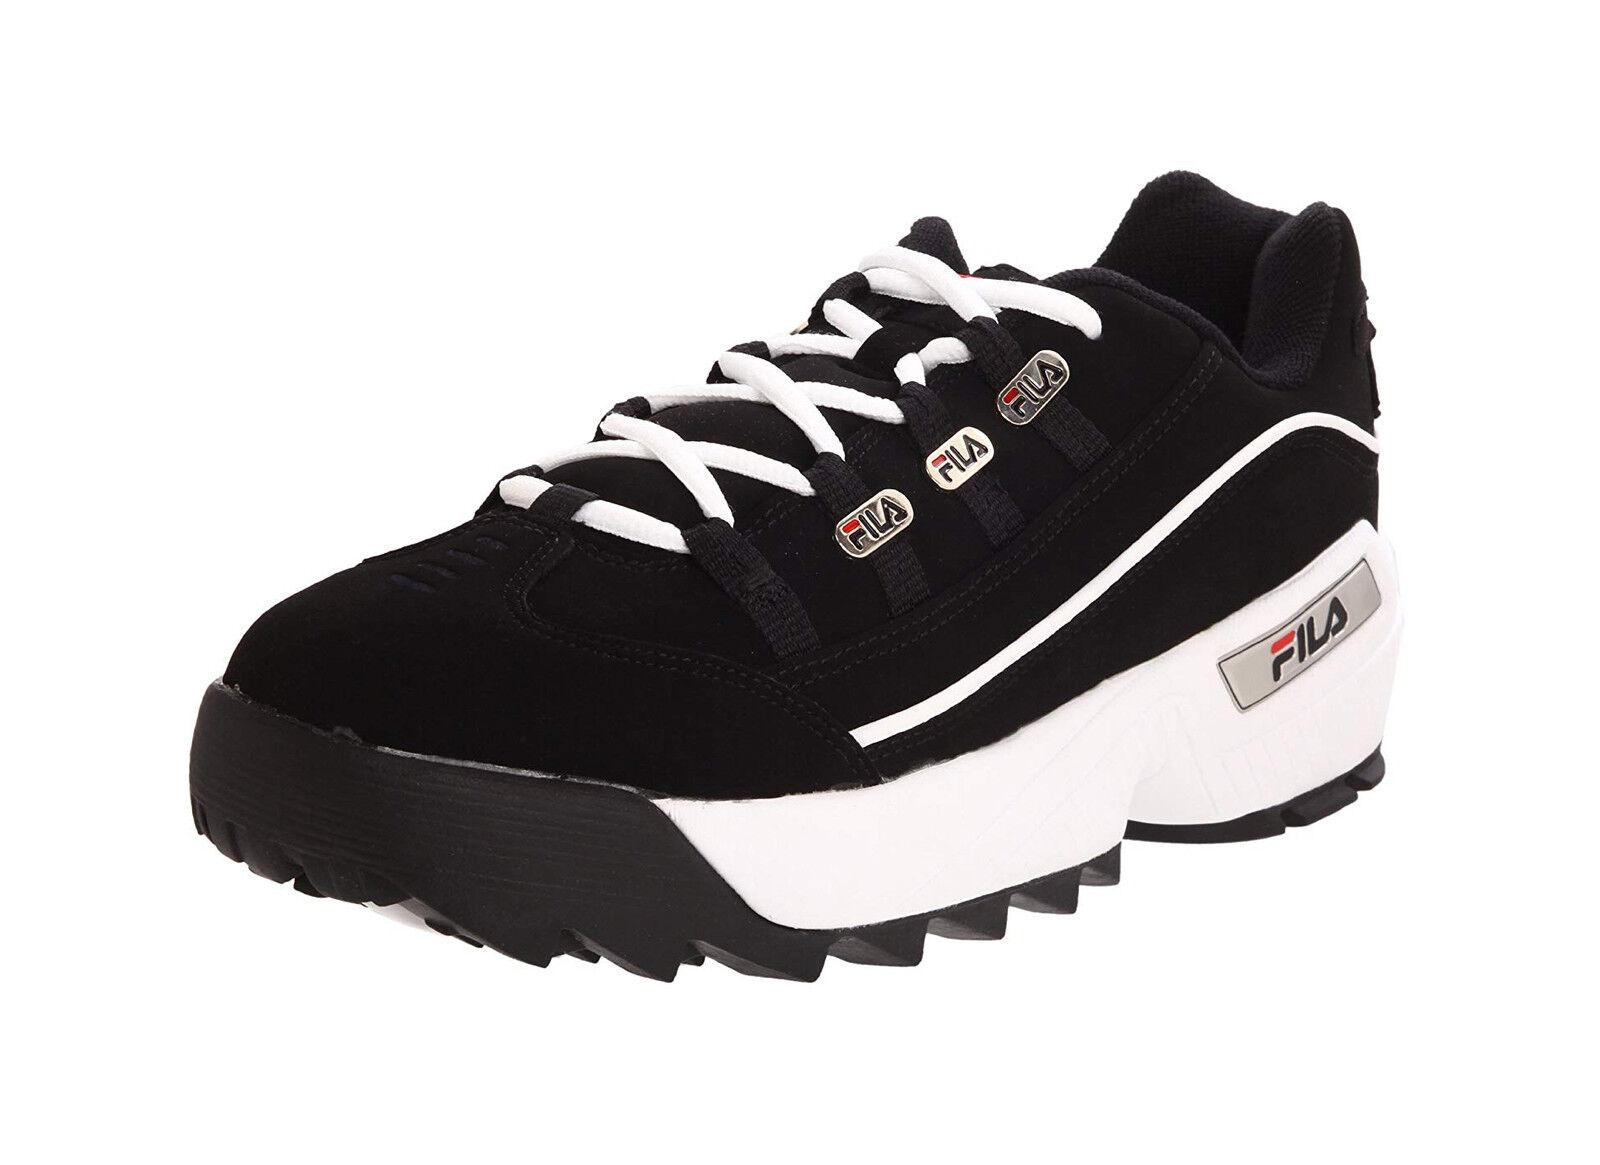 Skechers Lanson Rometo Hombre US 7.5 Blanco Zapatillas